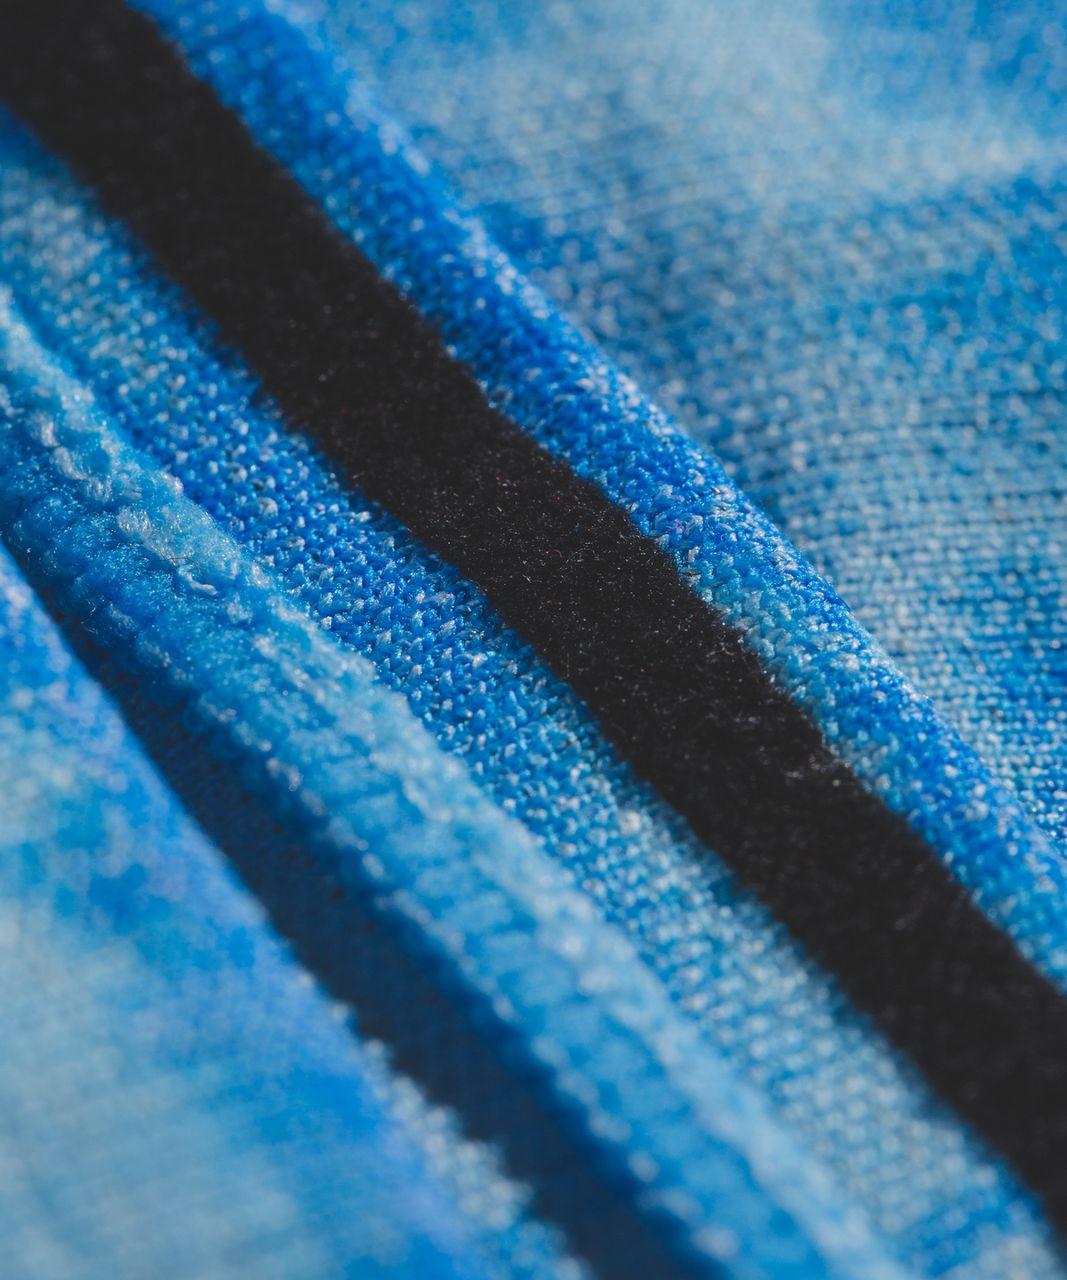 Lululemon Cardio Cross Trainer Headband - Pipe Dream Blue / Heathered Caspian Blue